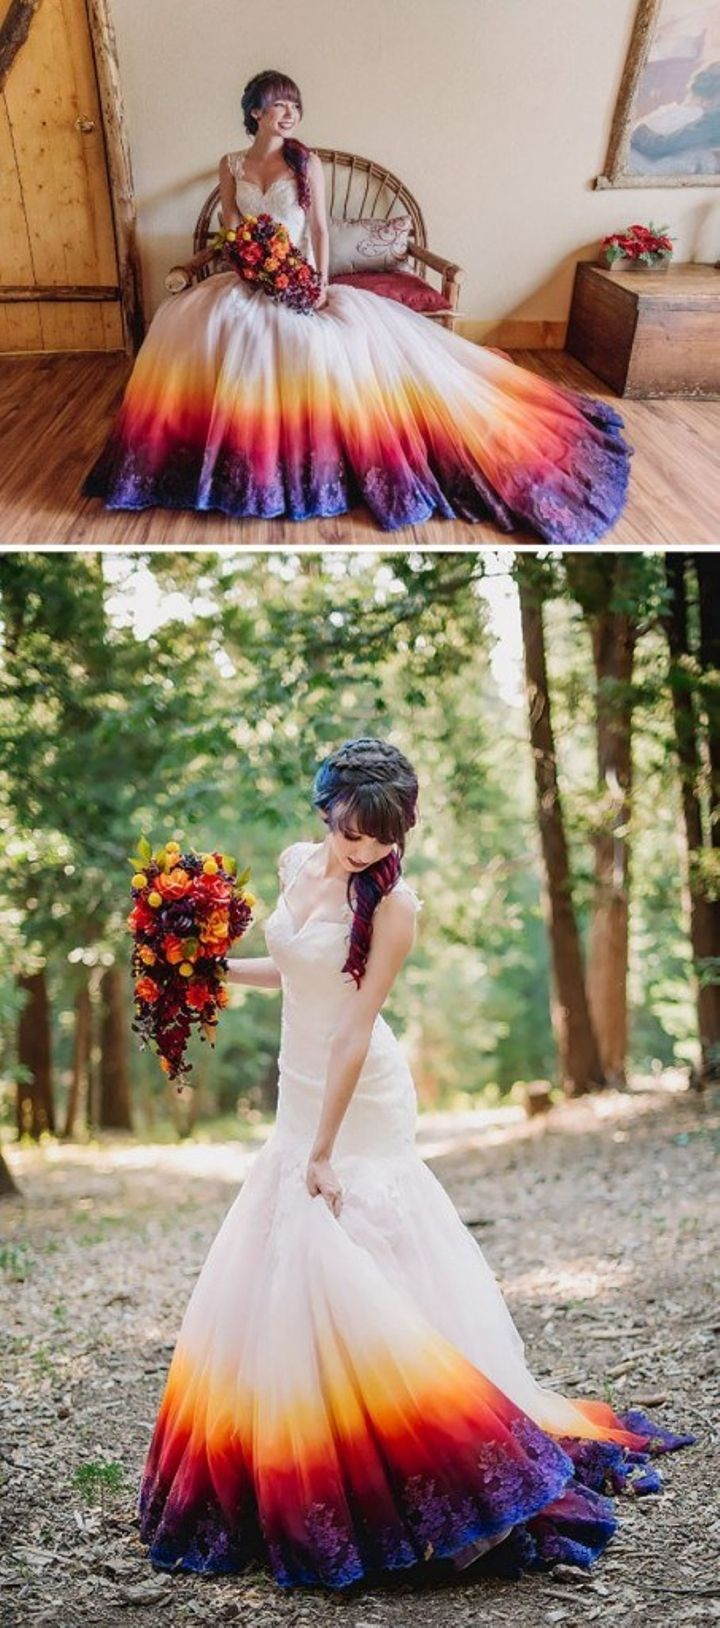 best futureuc images on pinterest weddings couples wedding